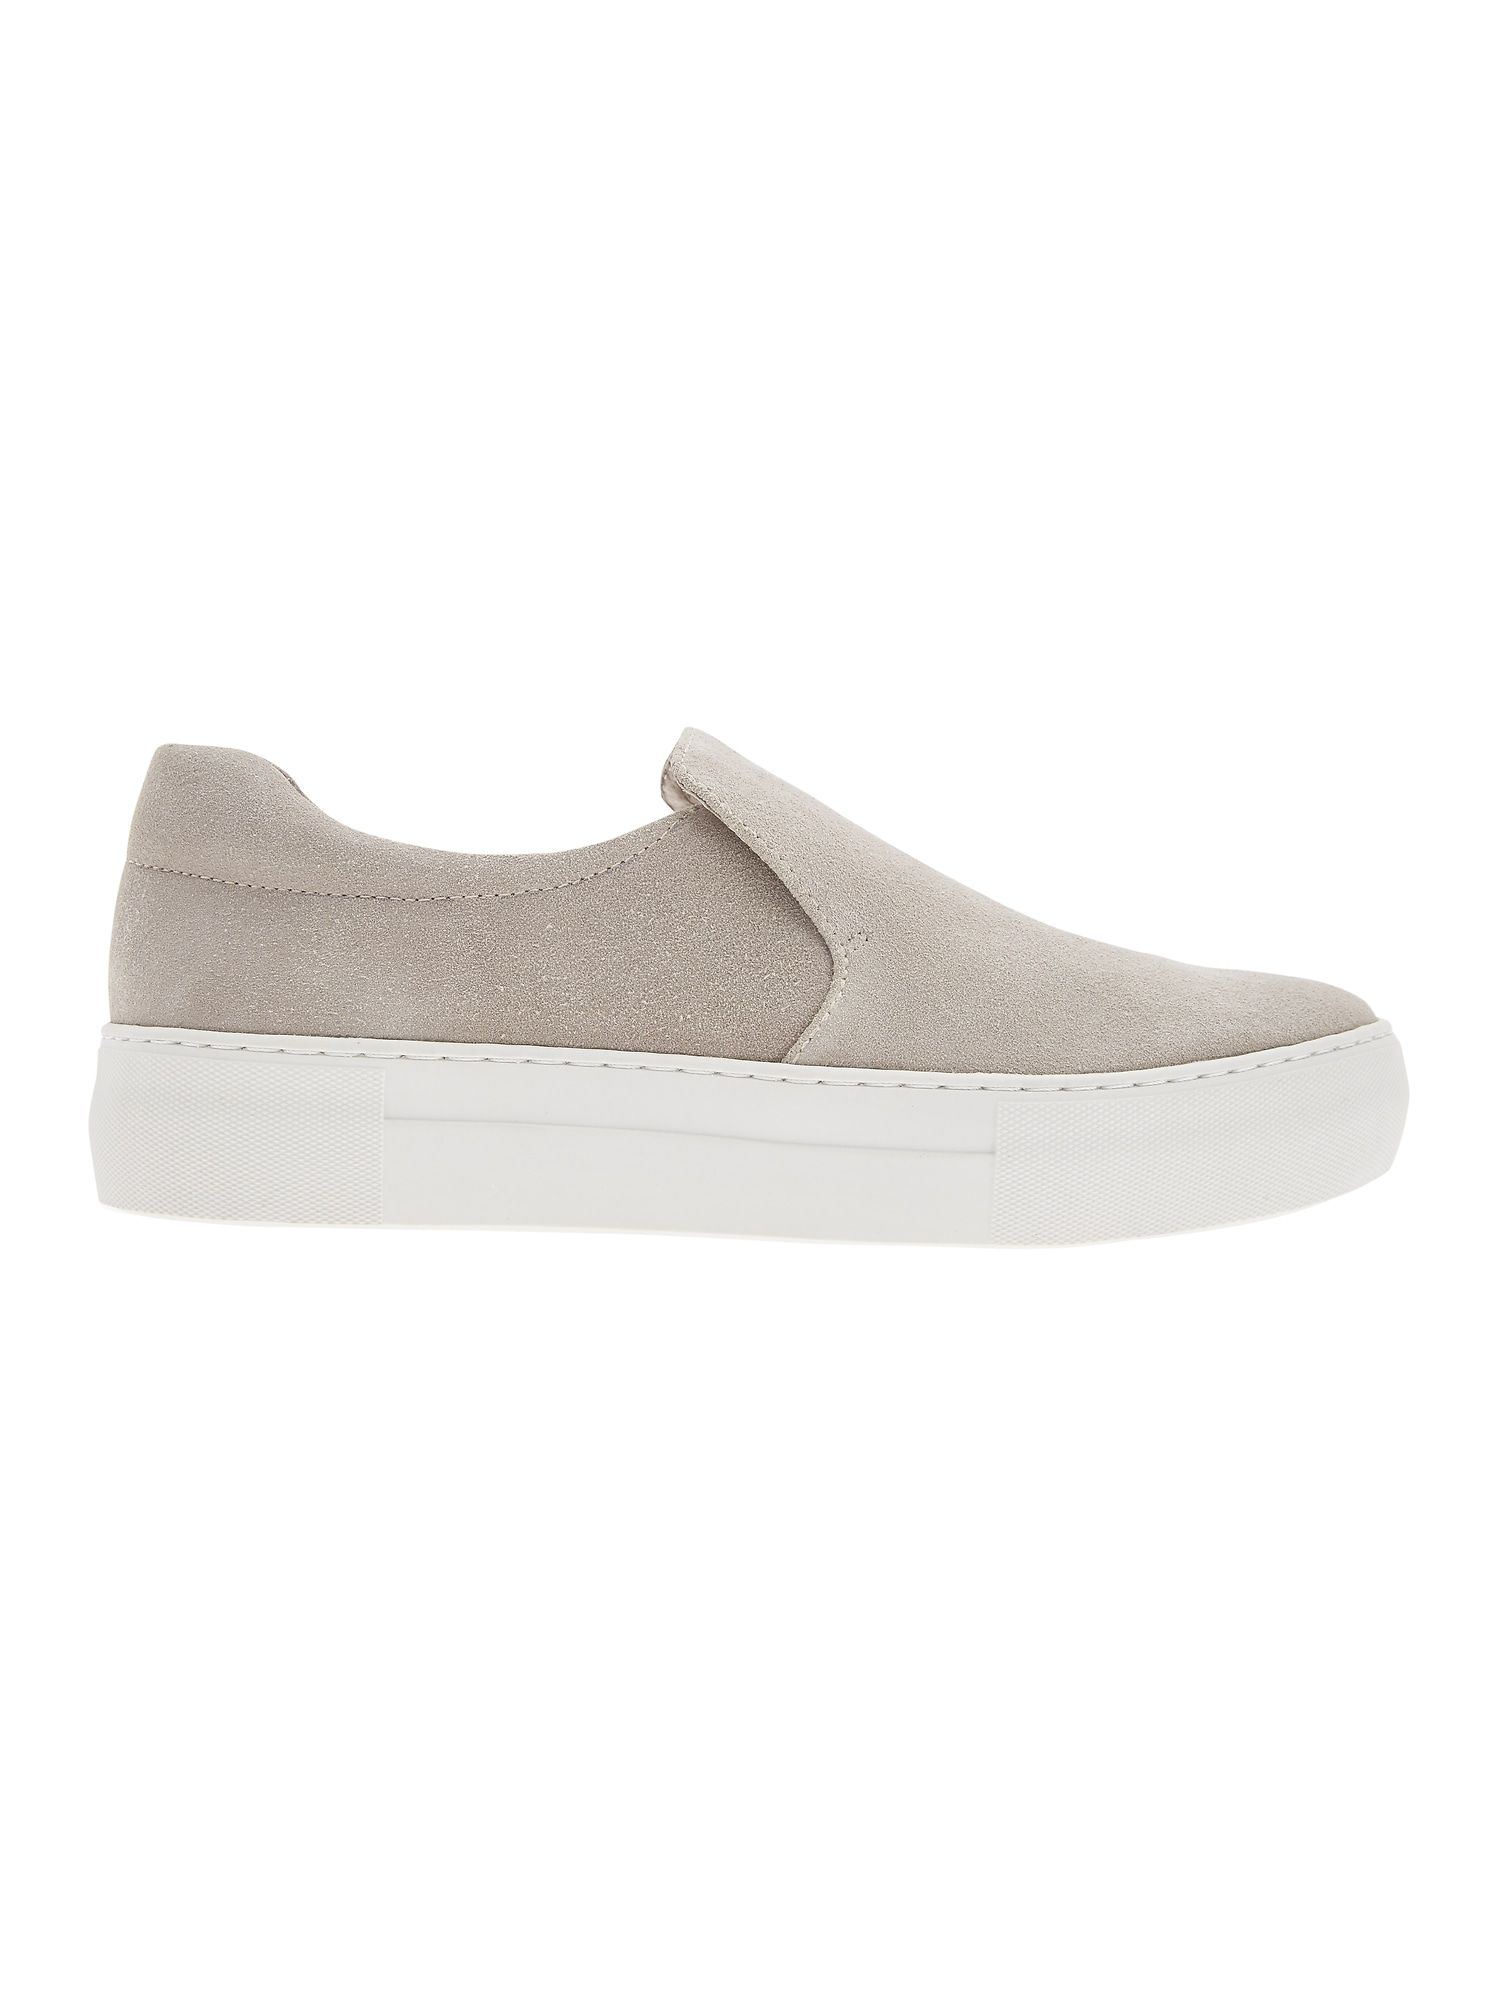 Attire Suede Sneaker By J/Slides